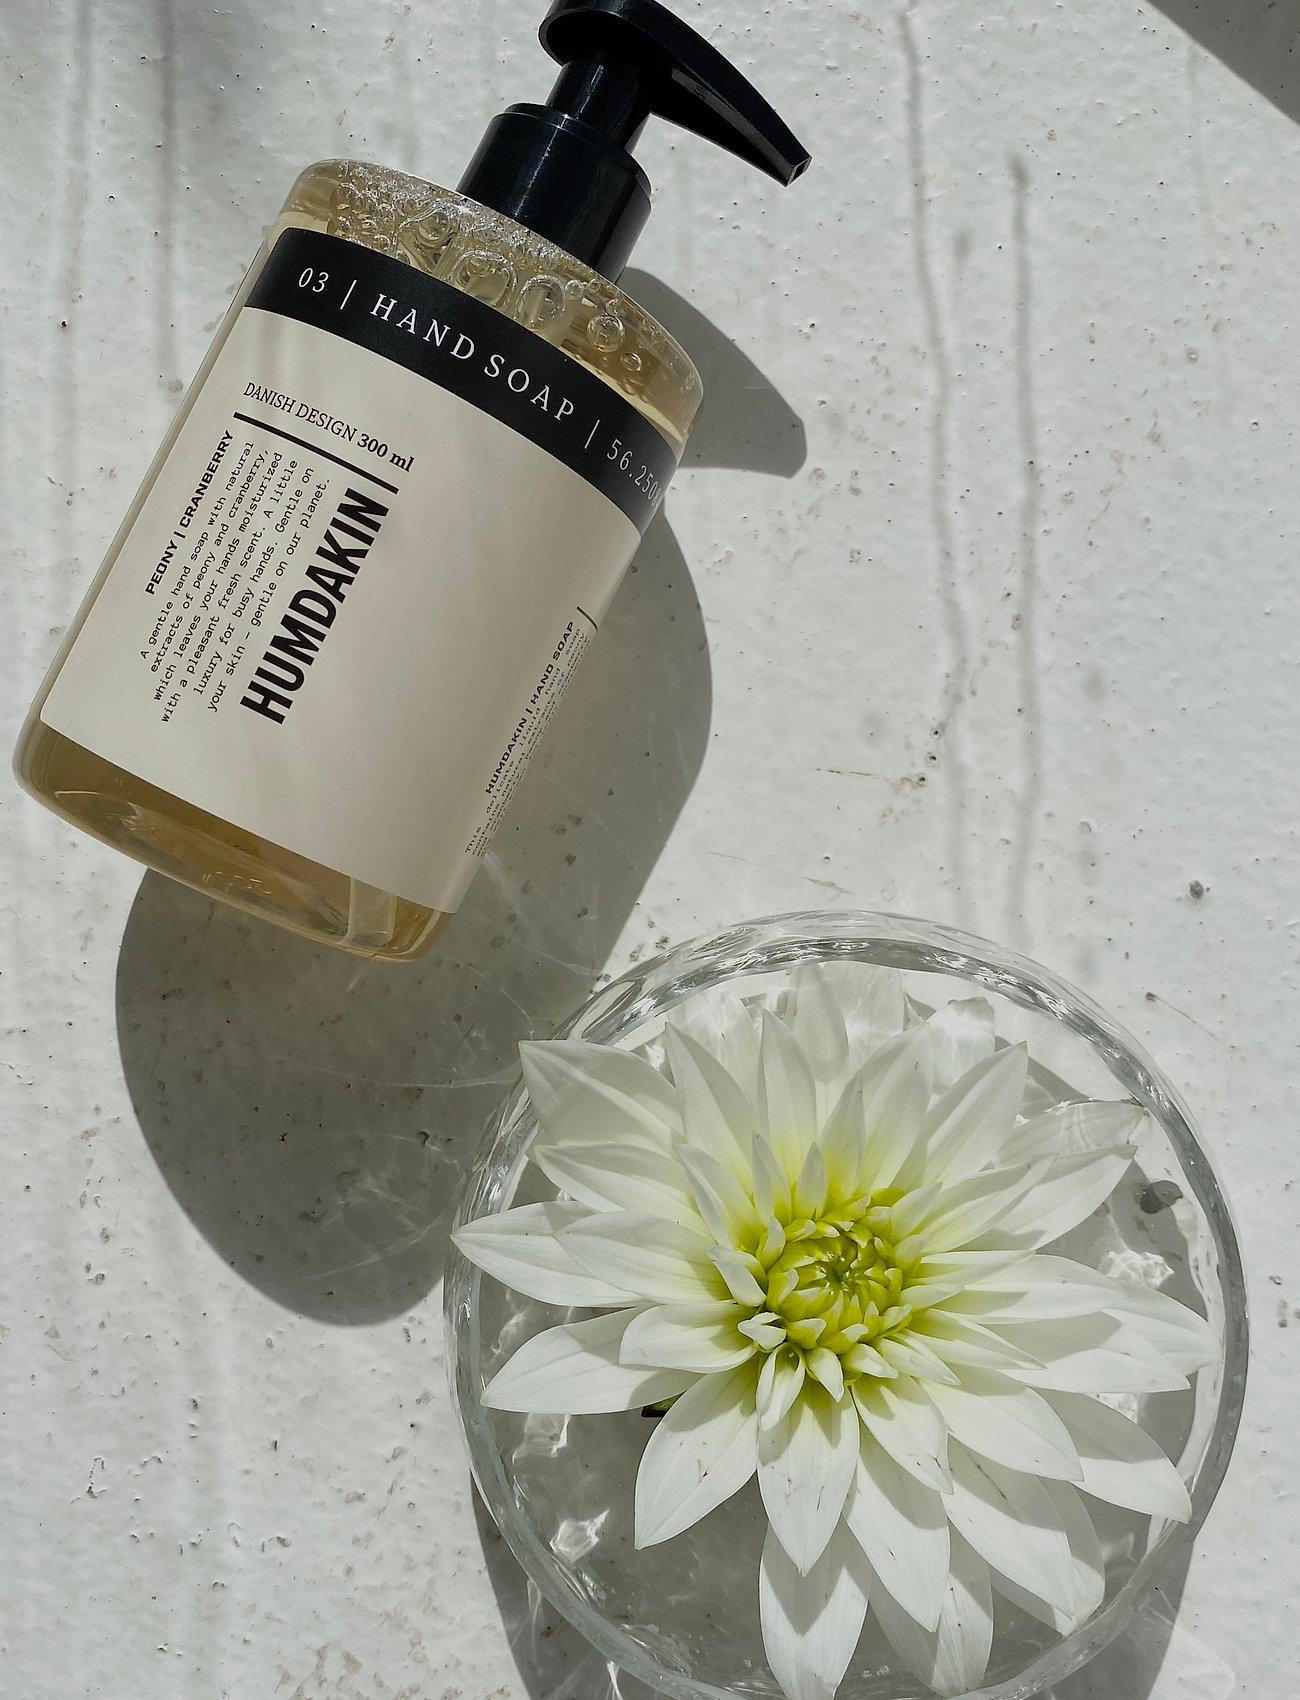 Humdakin - 03 hand soap - peony and cranberry - handtvål - clear - 0